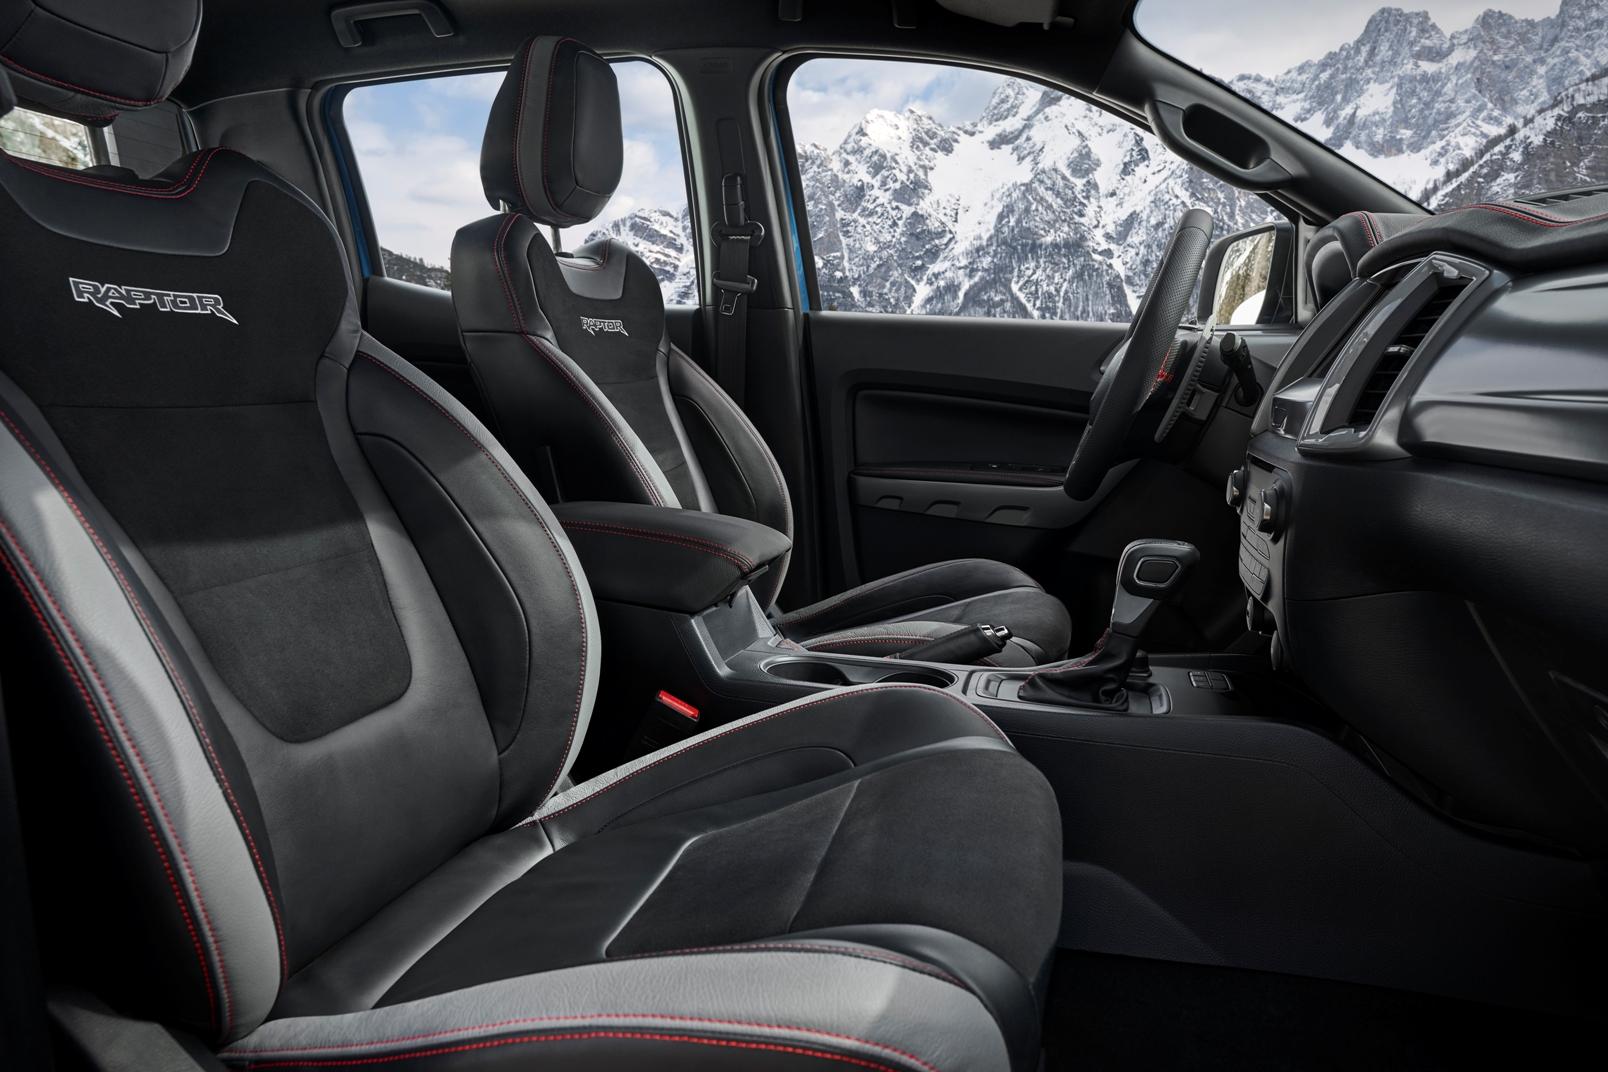 Ford Ranger Raptor Special Edition 2021 (11)